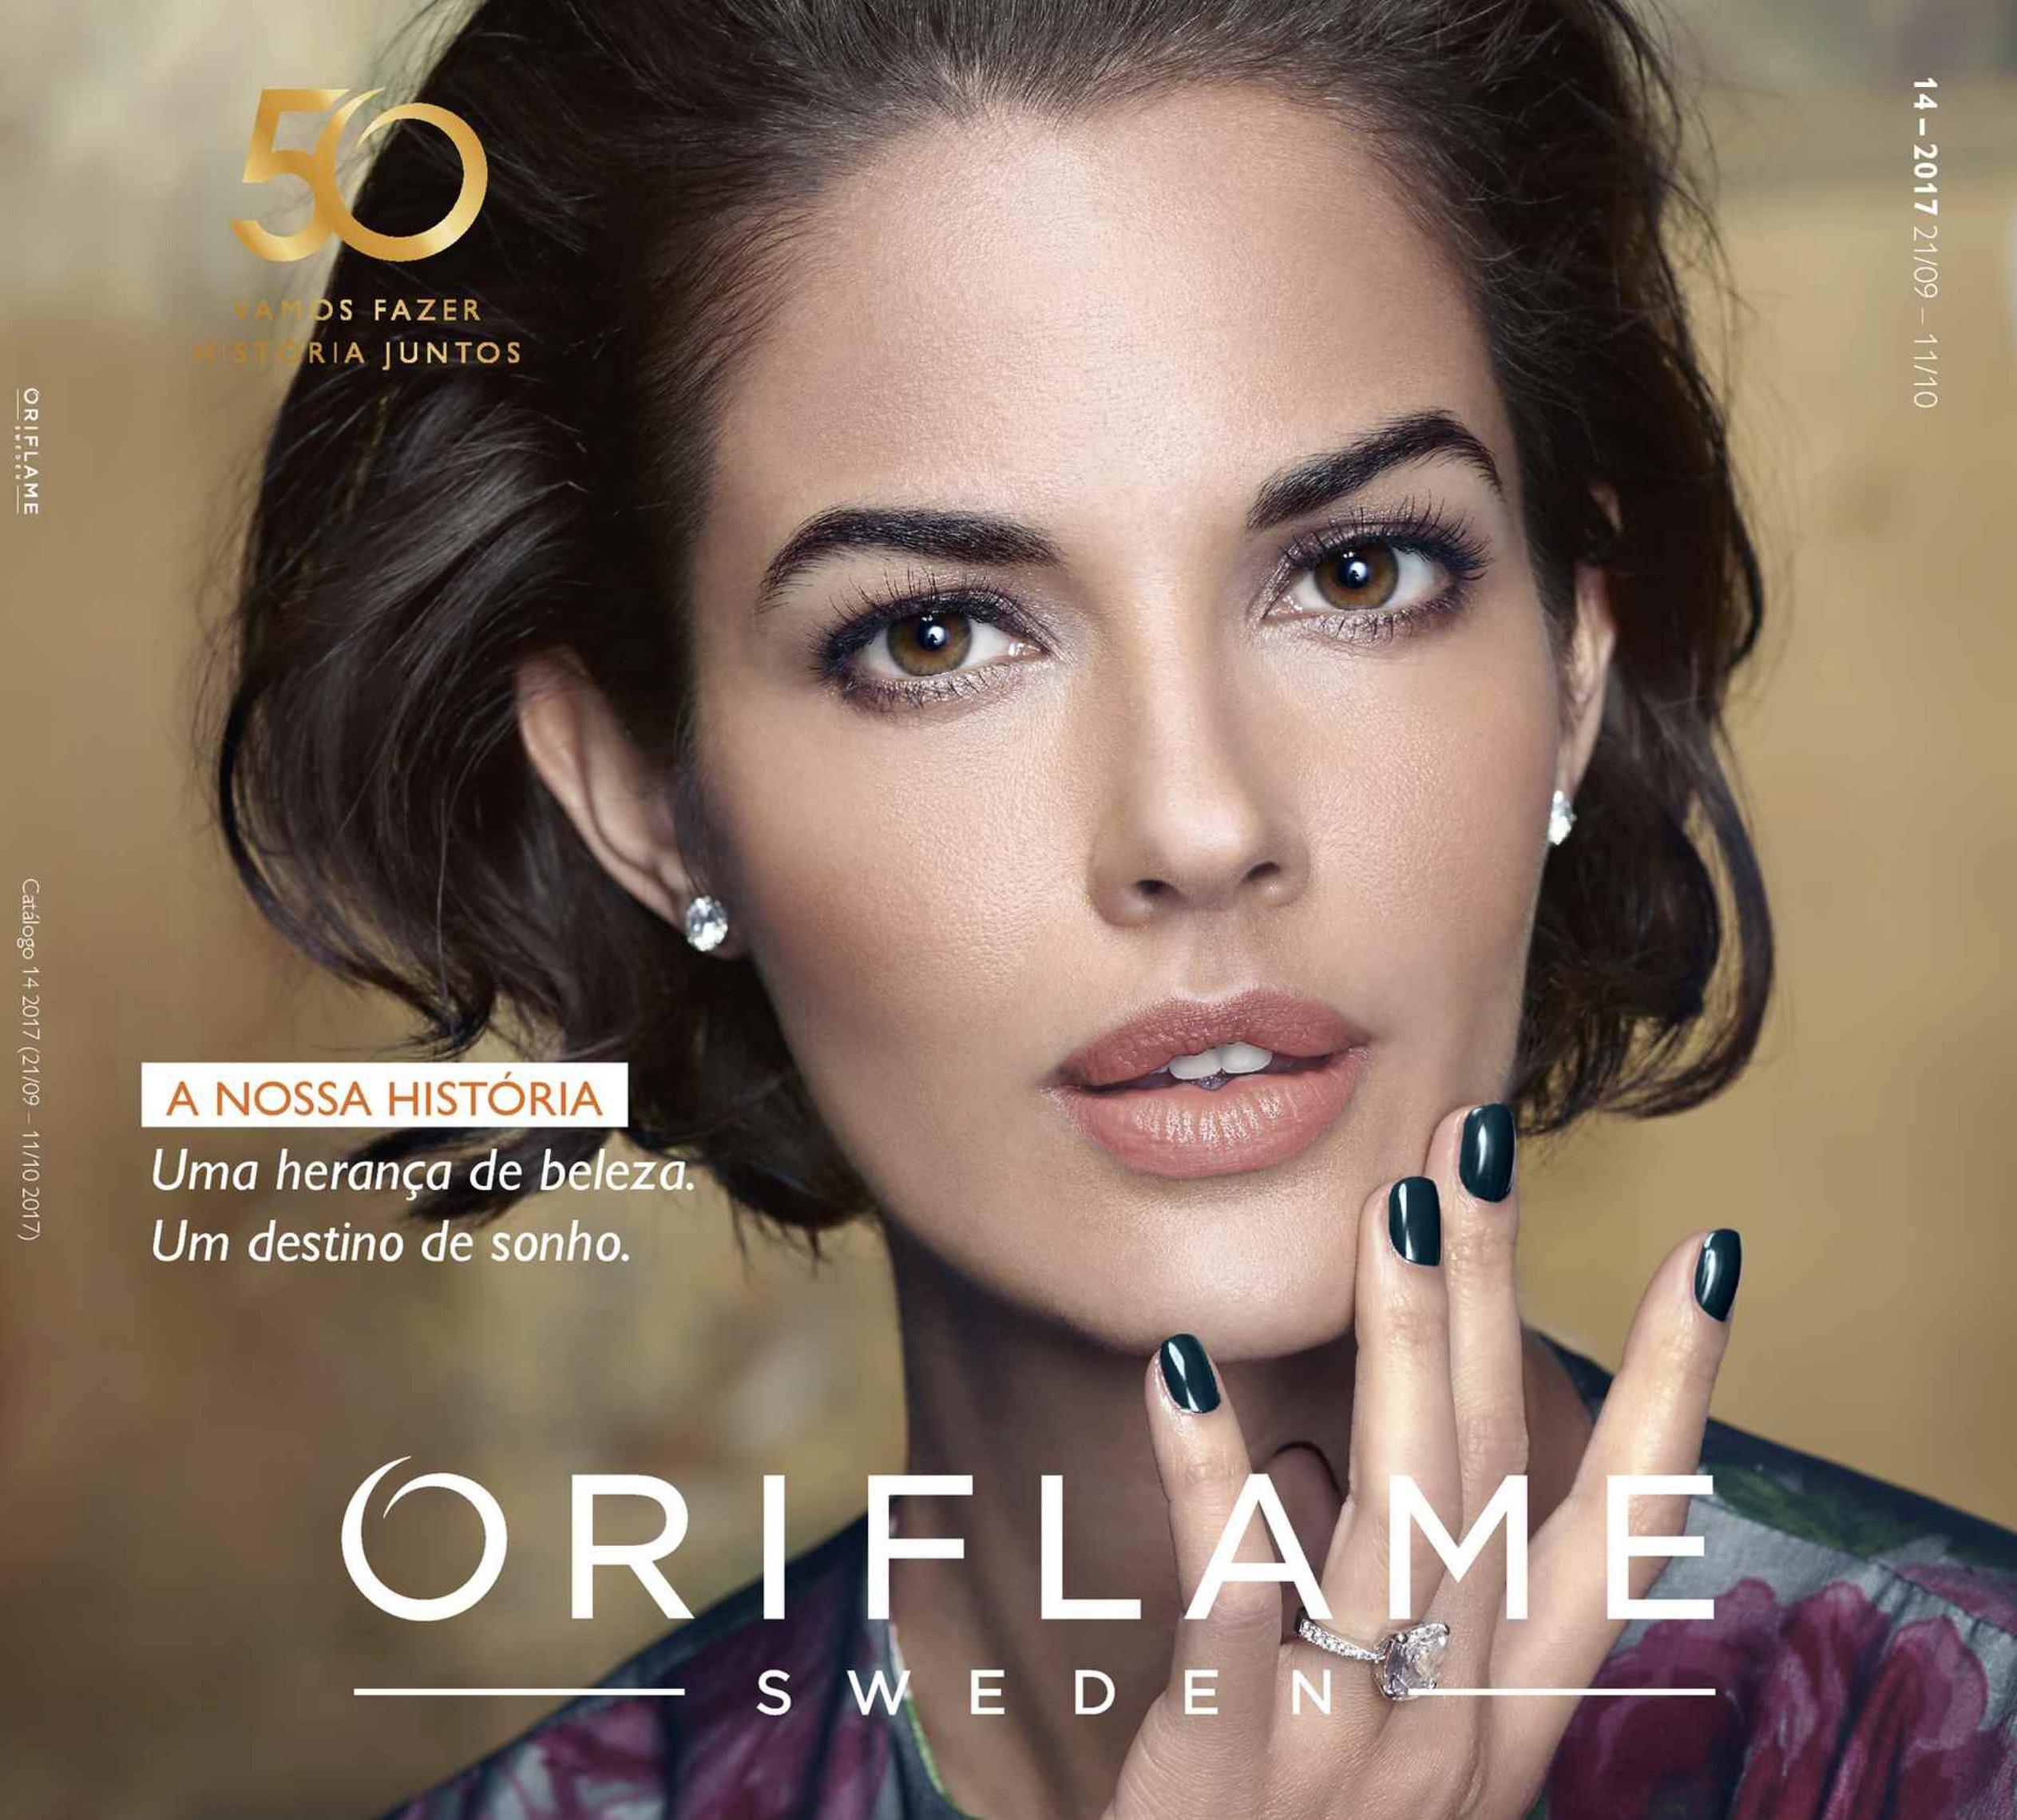 Oricarmen Catalogo 14 2017 Page 22 23 Created With Publitas Com